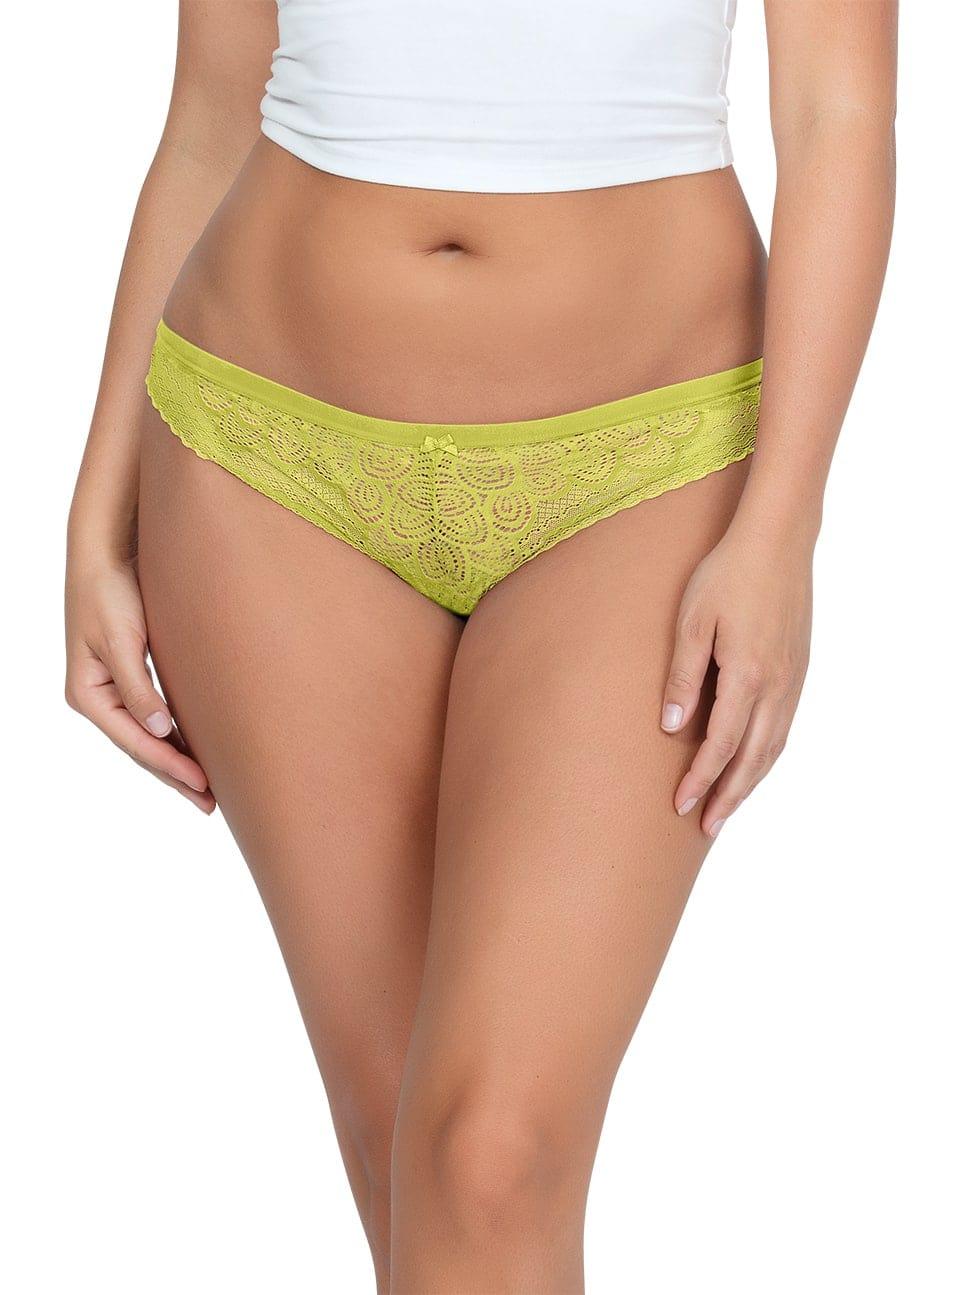 ParfaitPanty SoGlam ThongPP402 Lemonade front - Parfait Panty So Glam Thong - Lemonade - PP402